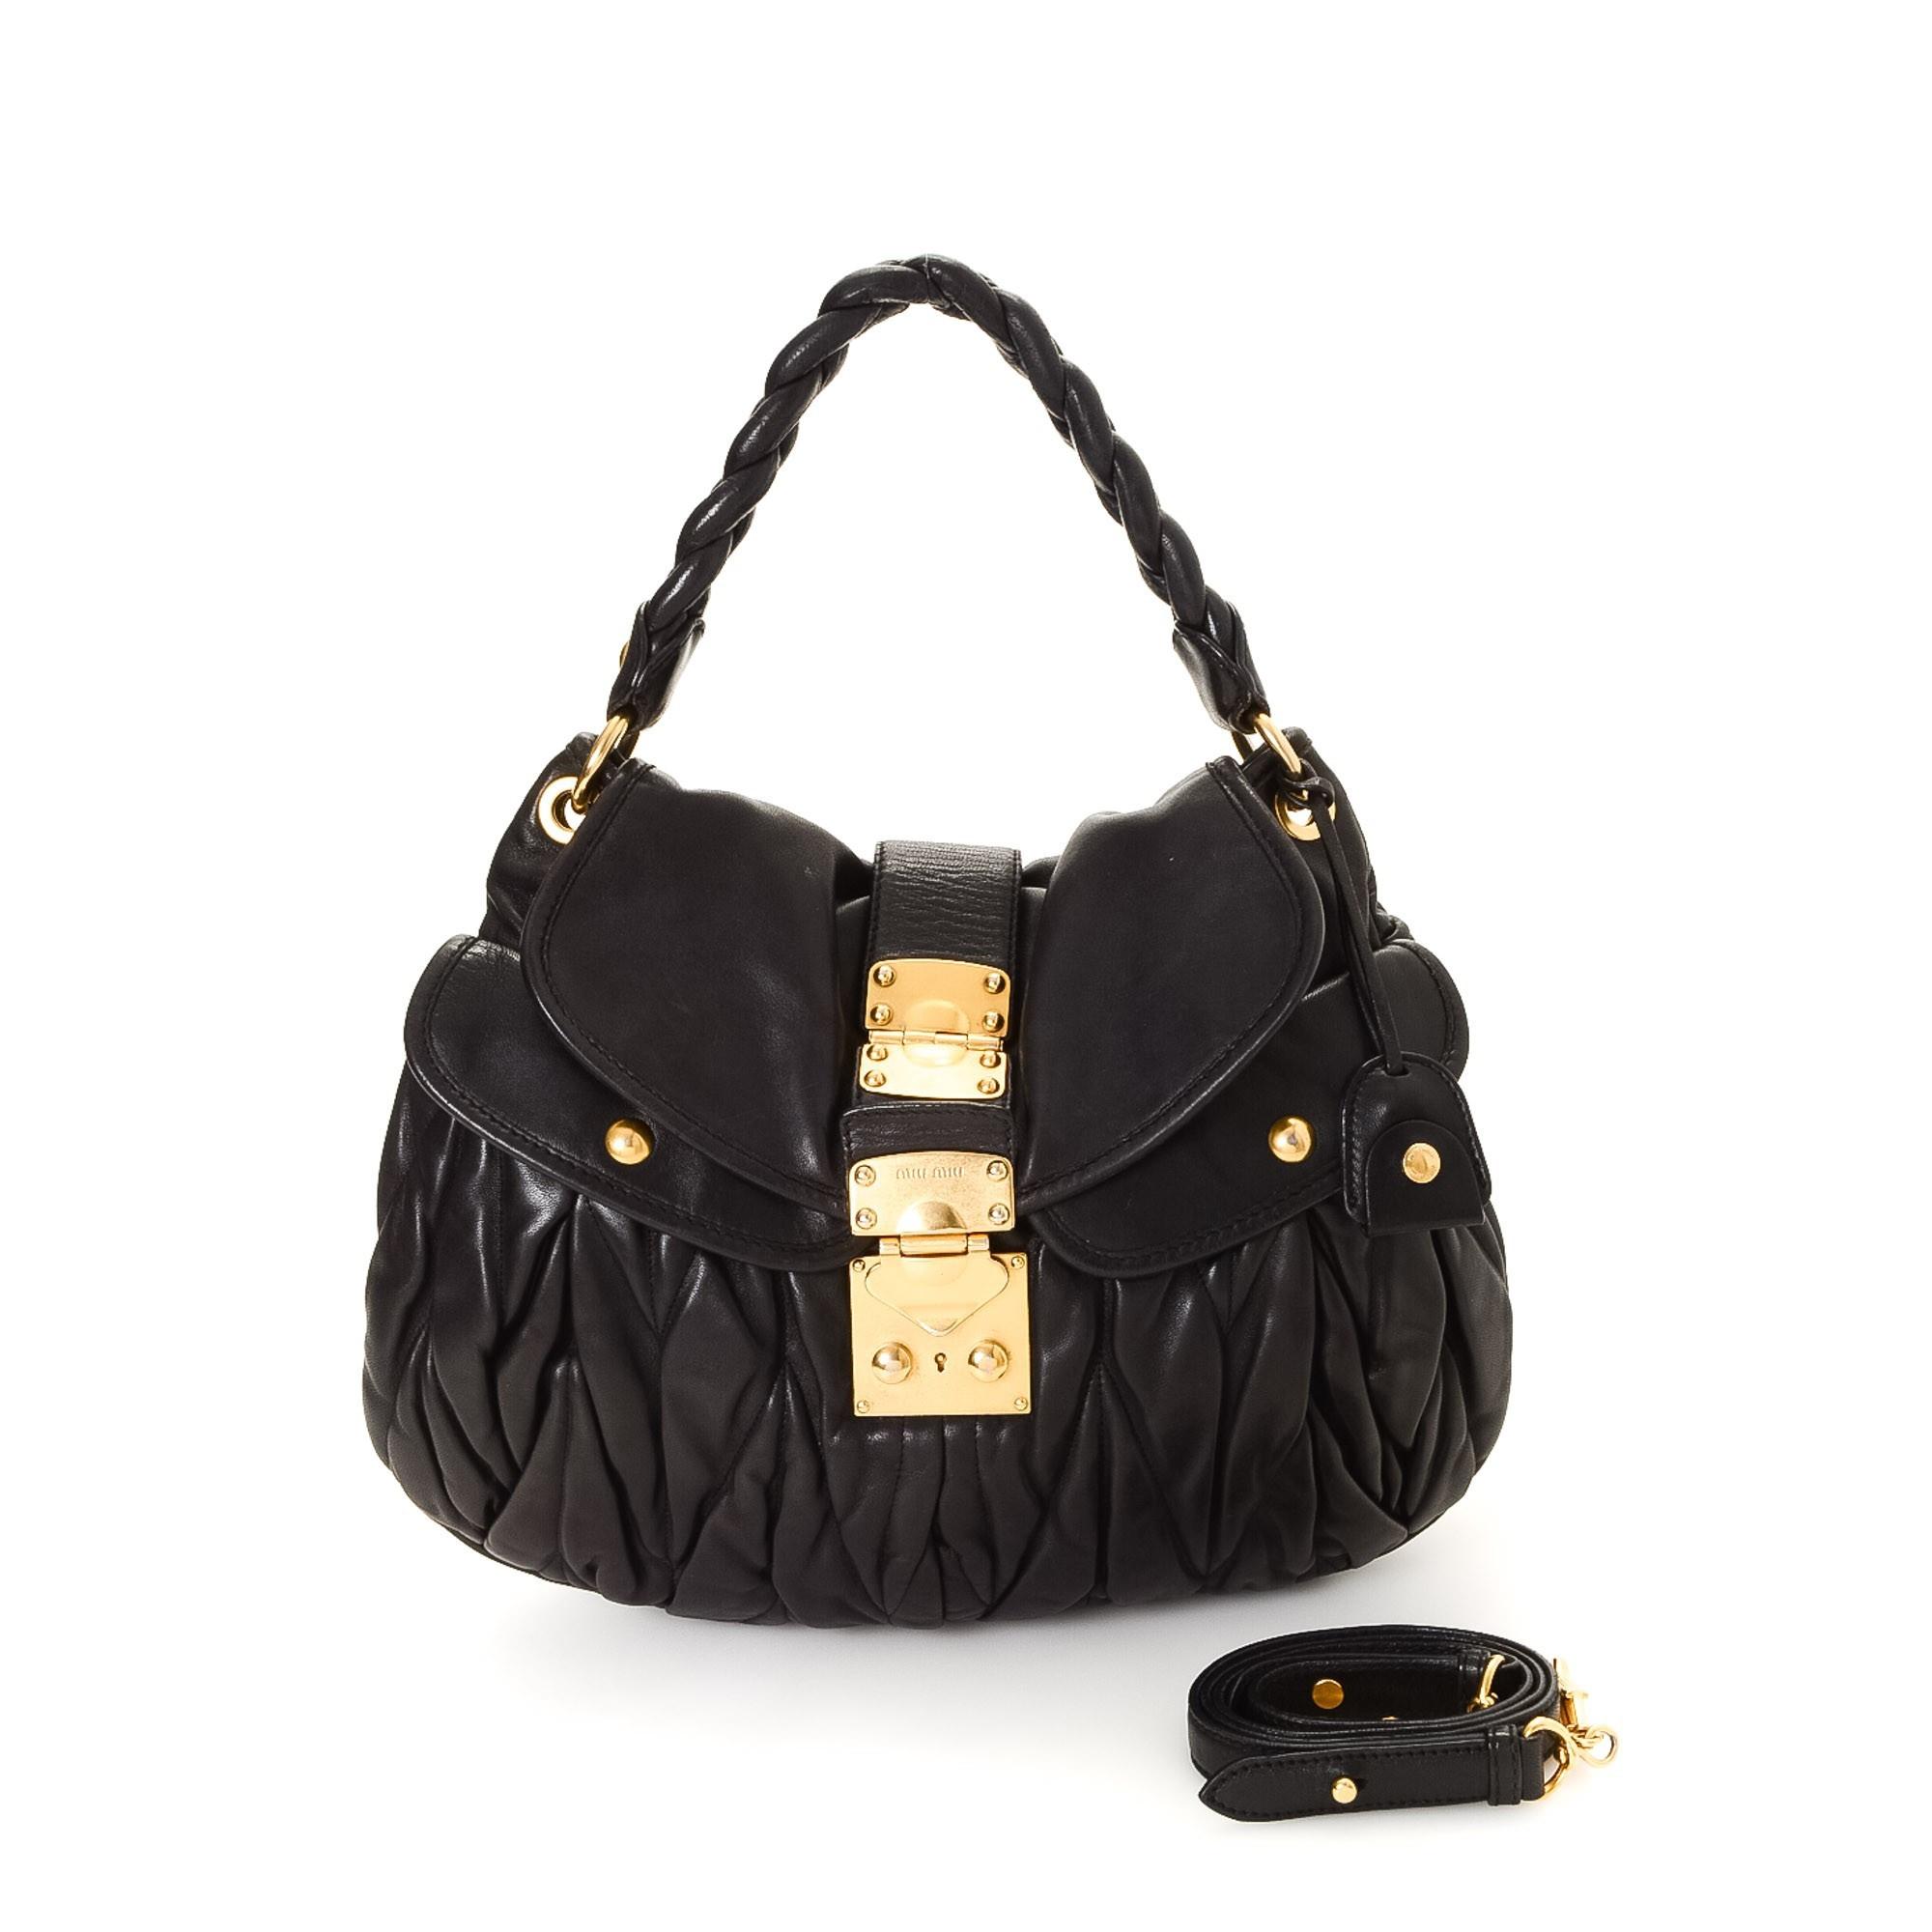 Miu Miu Matelasse Coffer Two Way Bag Matelasse lux Black Leather Shoulder Bag LXRCO